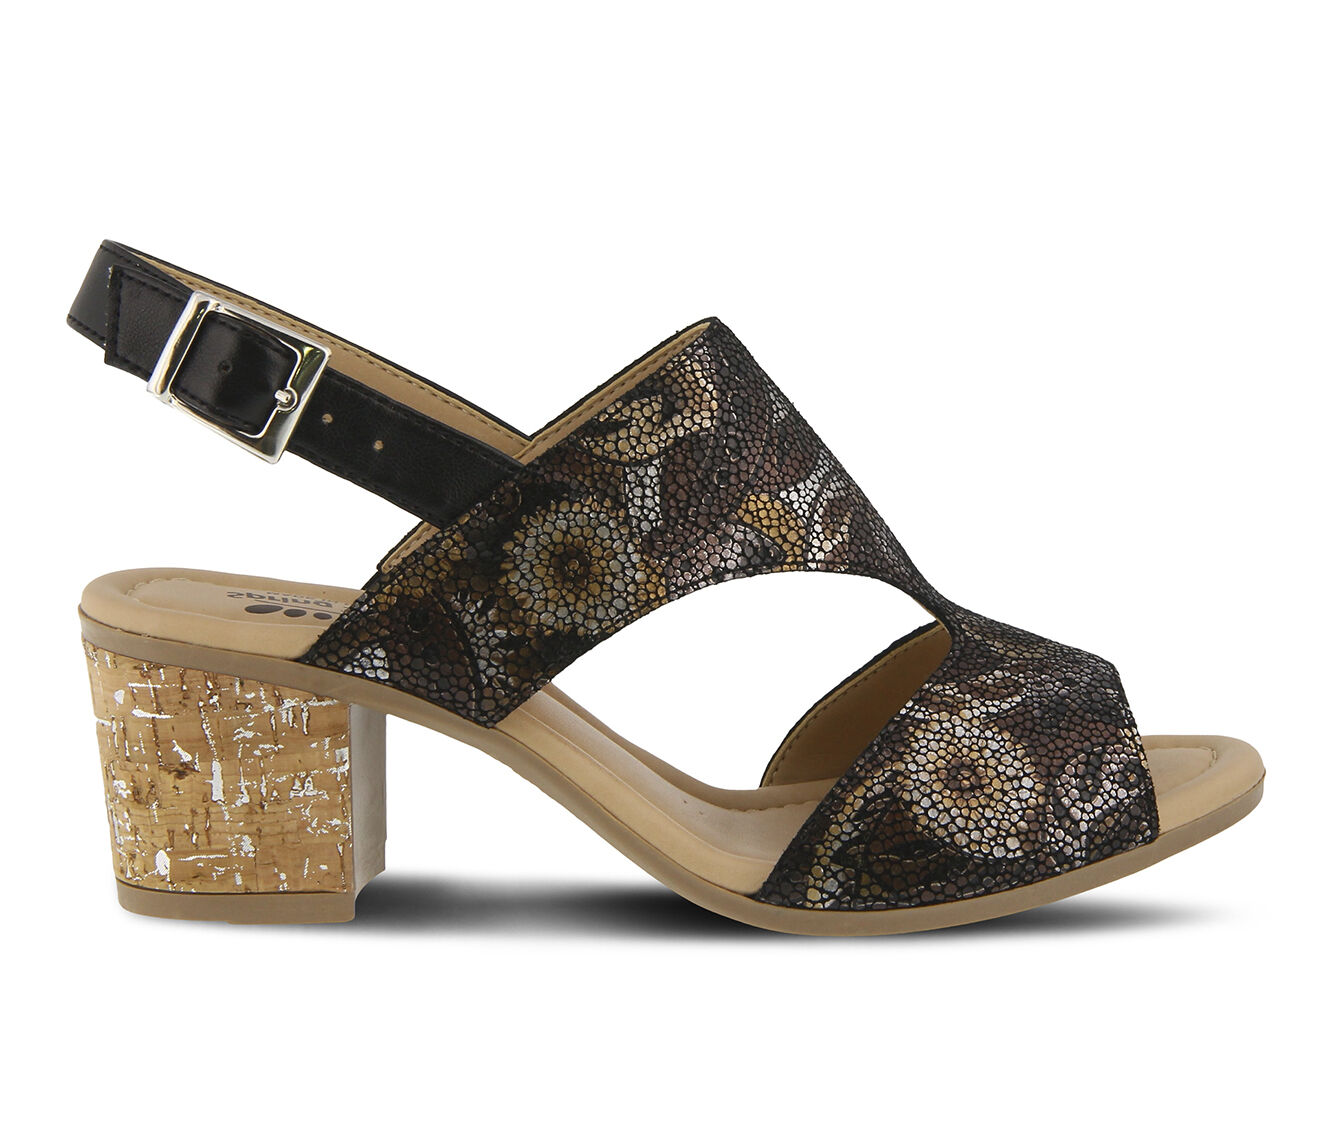 Fashionable Style Women's SPRING STEP Fiorentina Dress Sandals Black Multi